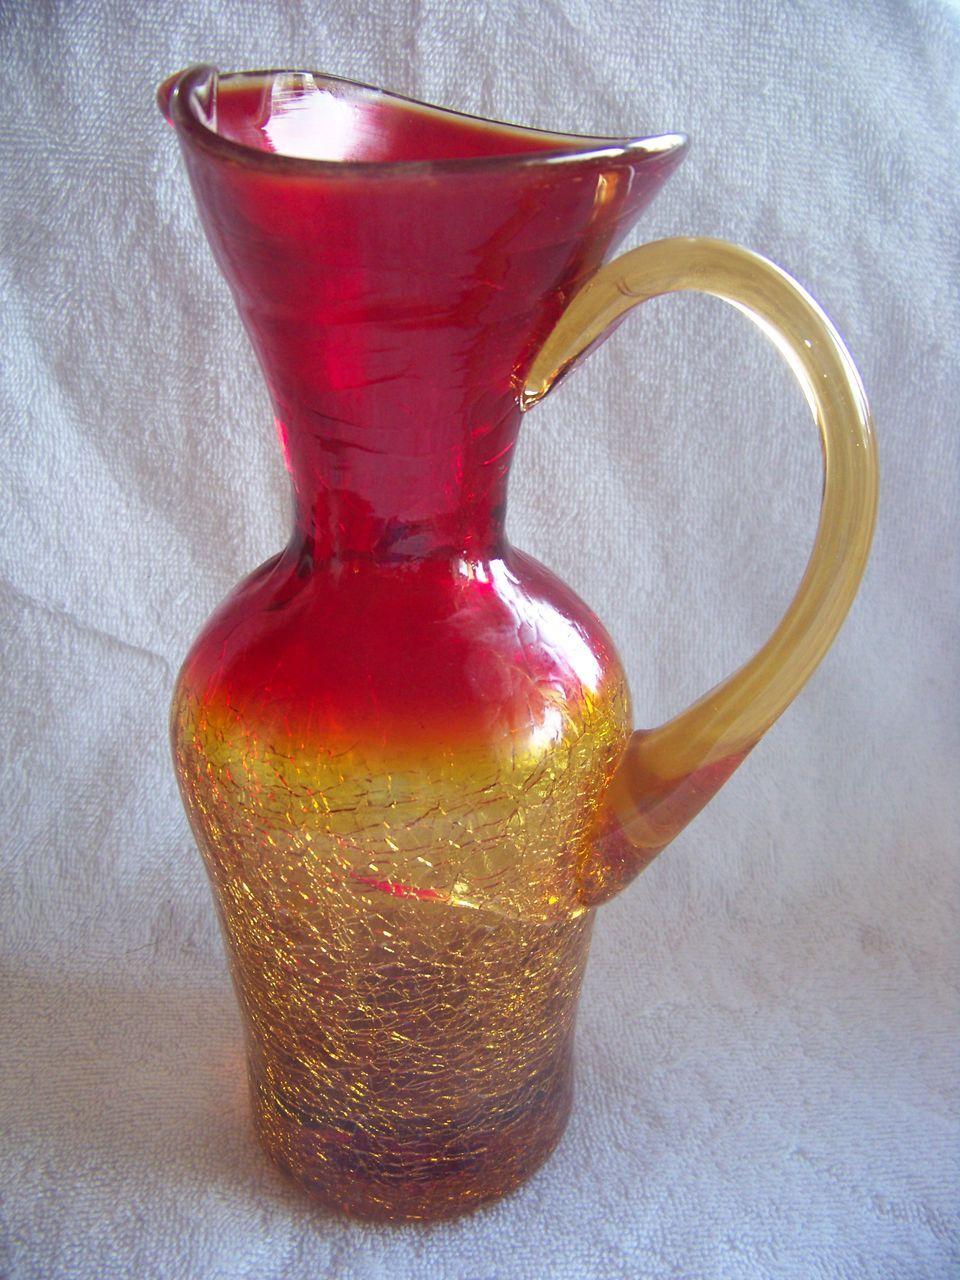 glass amberina crackle pitcher pitchers antique vase blenko decanter glasses viking blown bottles visit vases kiss